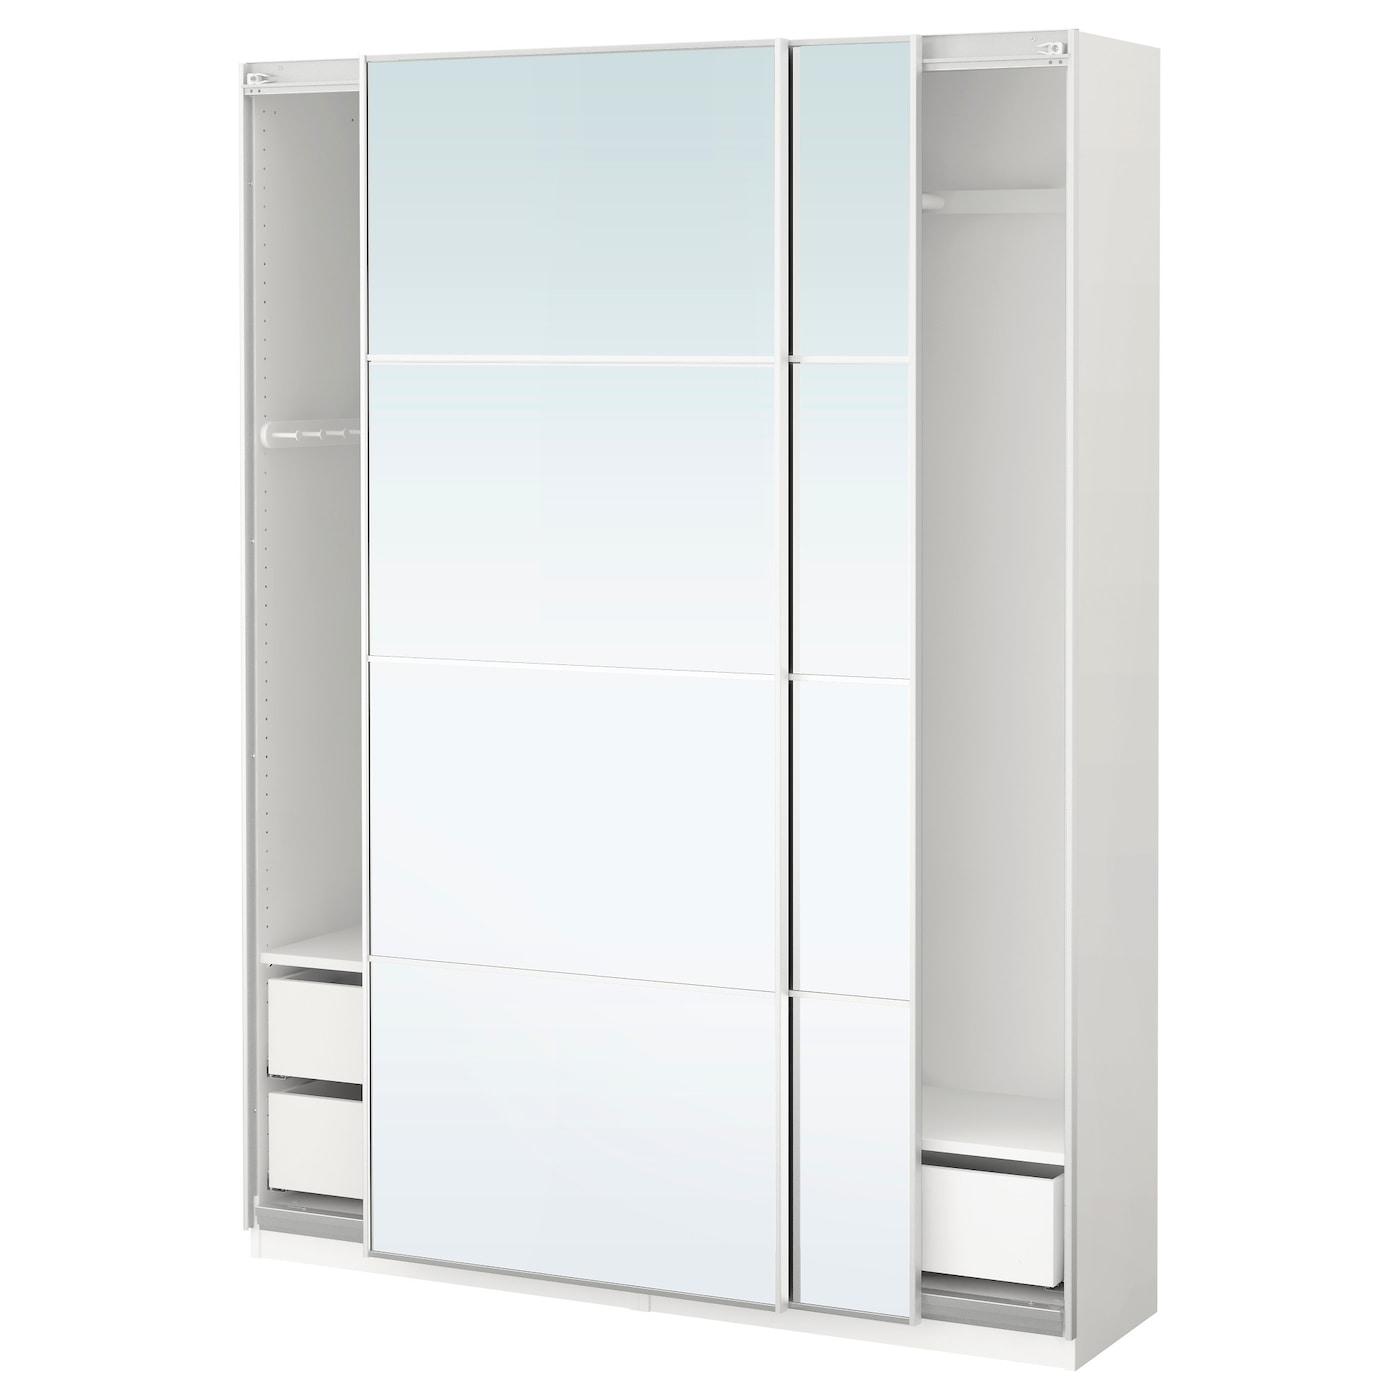 Pax Armoire Penderie Blanc Auli Miroir Ikea